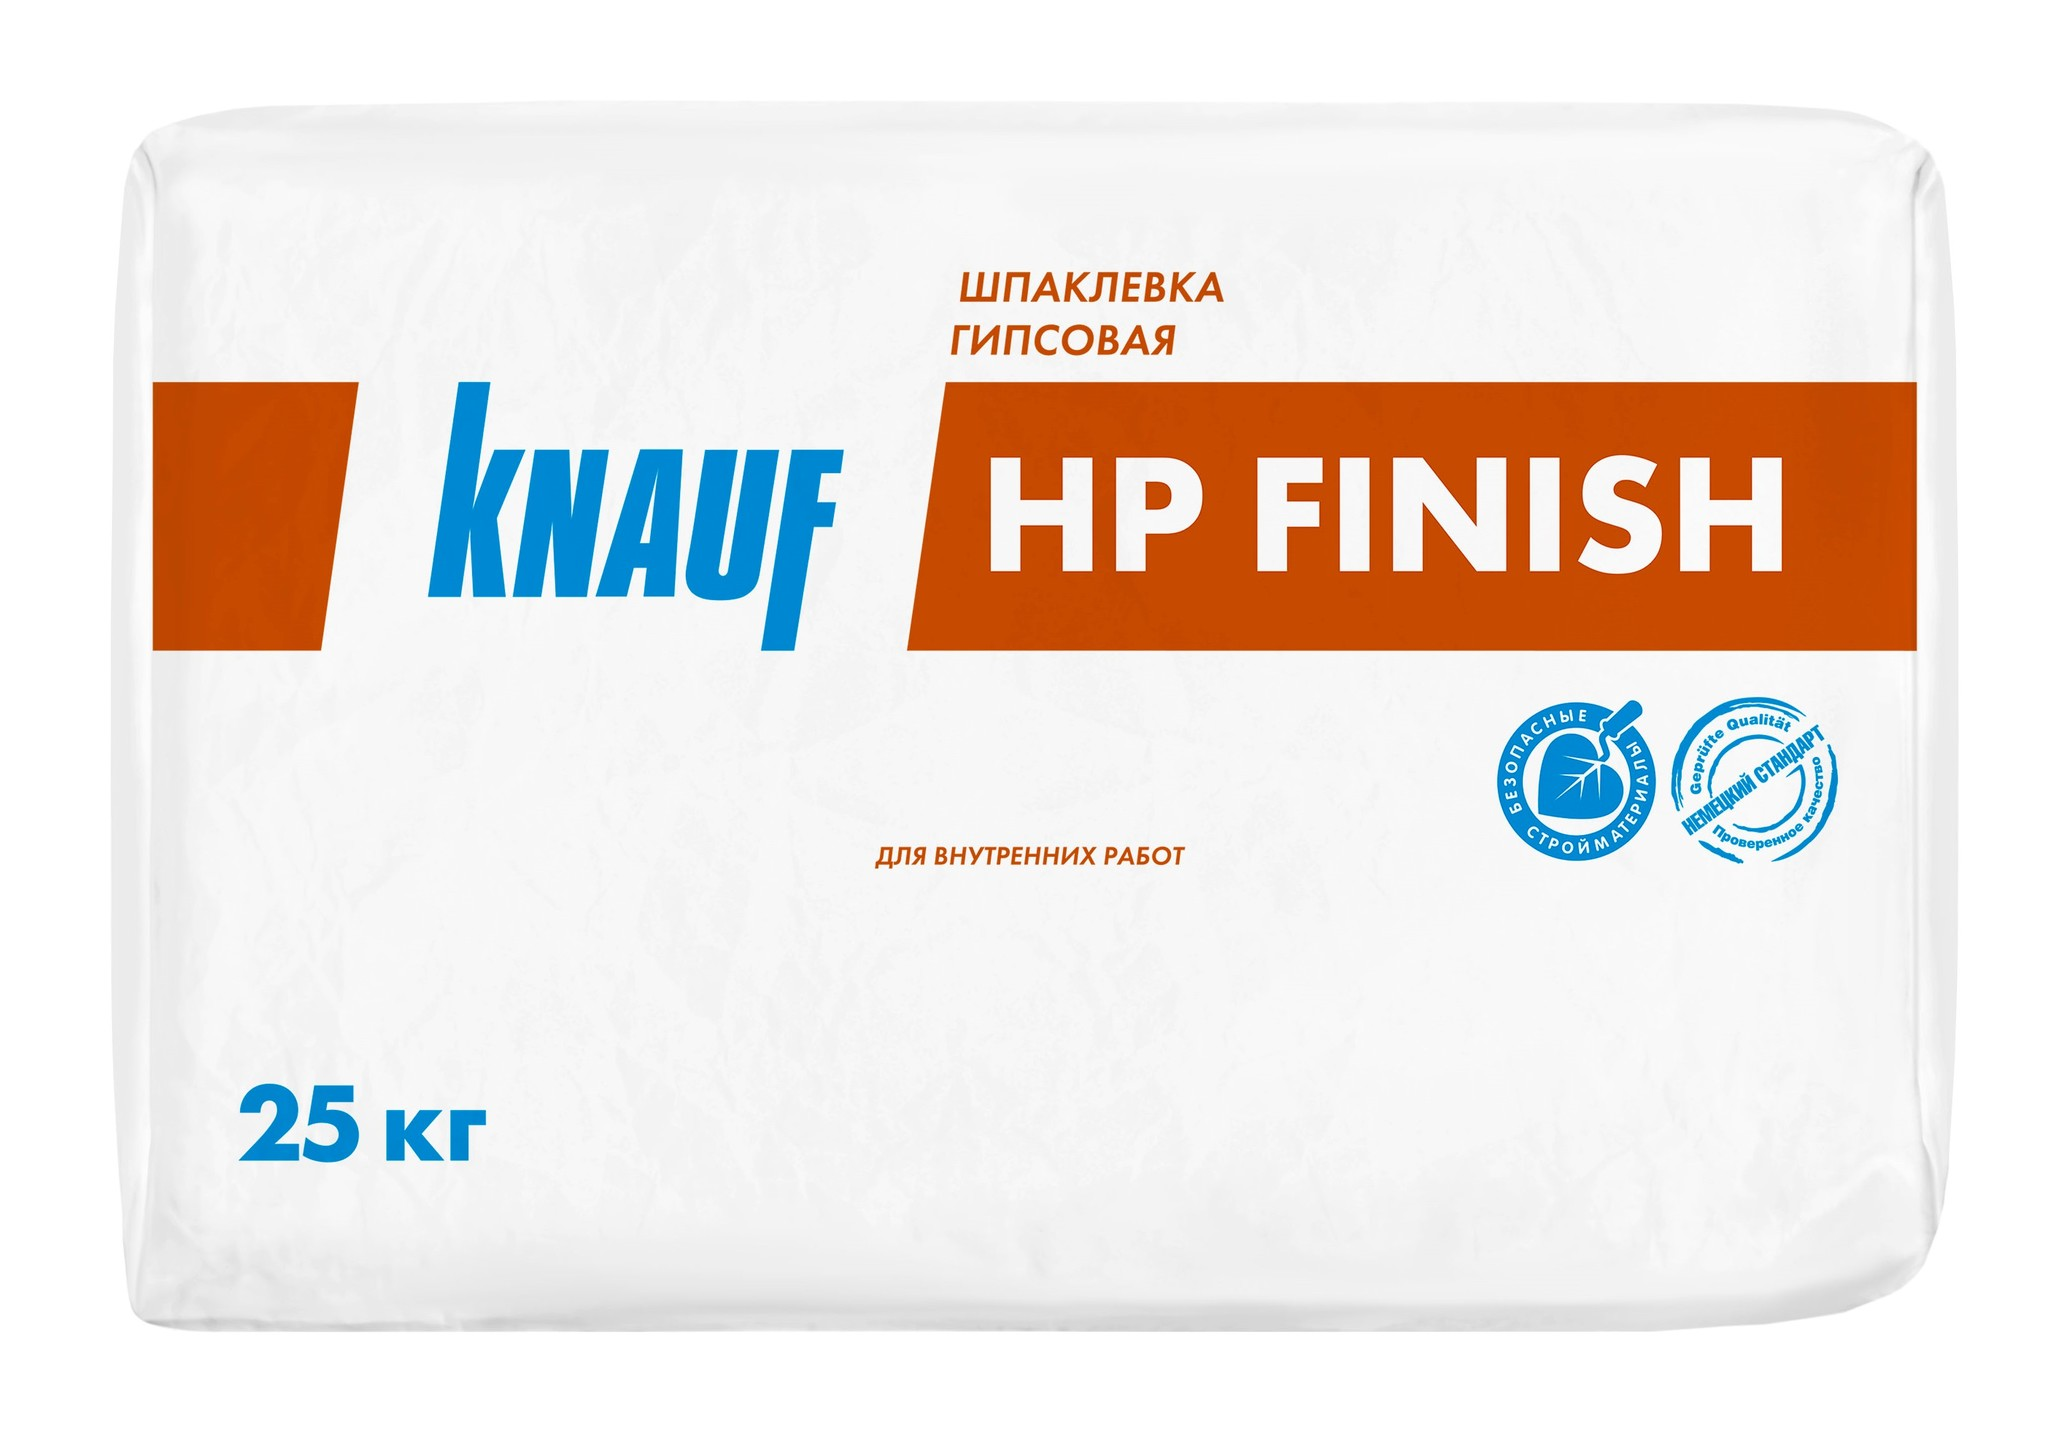 Шпаклевки Шпаклёвка Knauf ХП-Финиш гипсовая, 25 кг 30e993cbe52b46c89b6553b00f957821.jpg